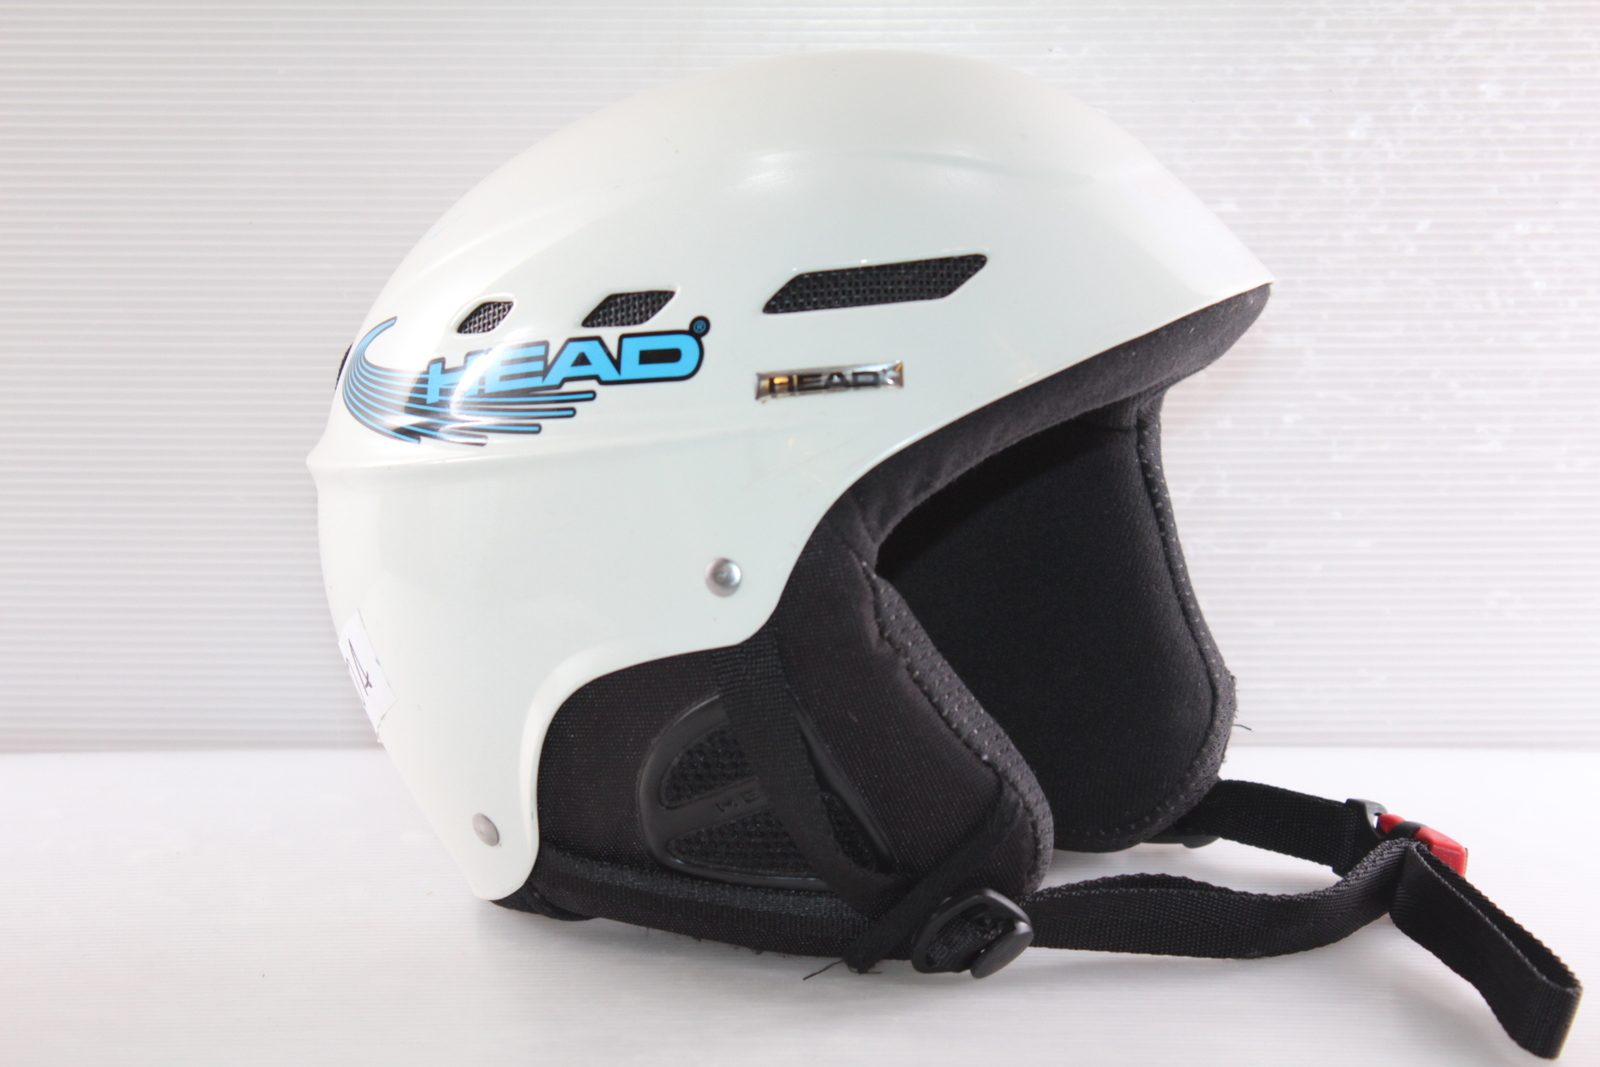 Dámská lyžařská helma Head  vel. 50